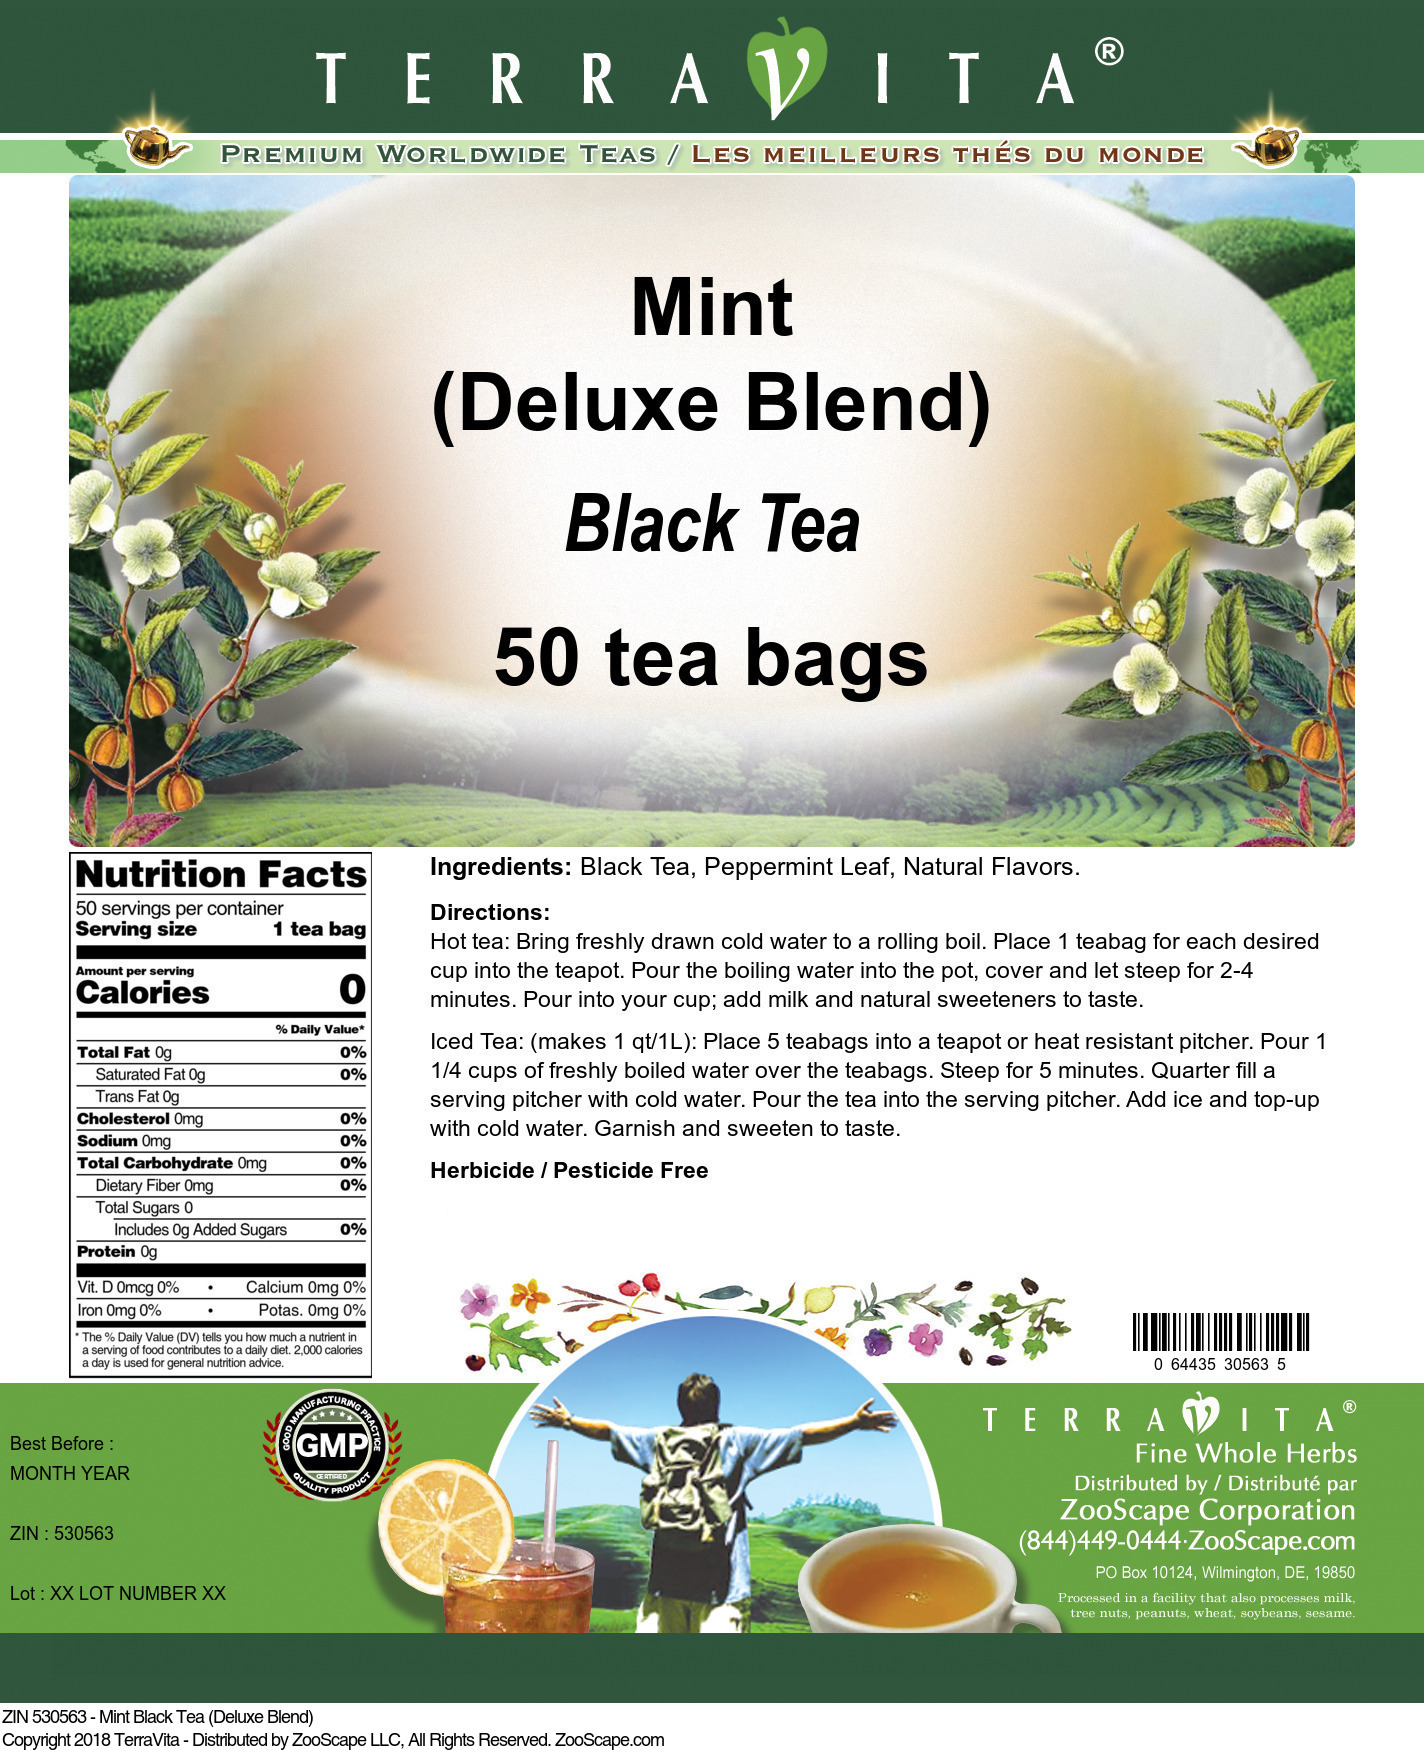 Mint Black Tea (Deluxe Blend)